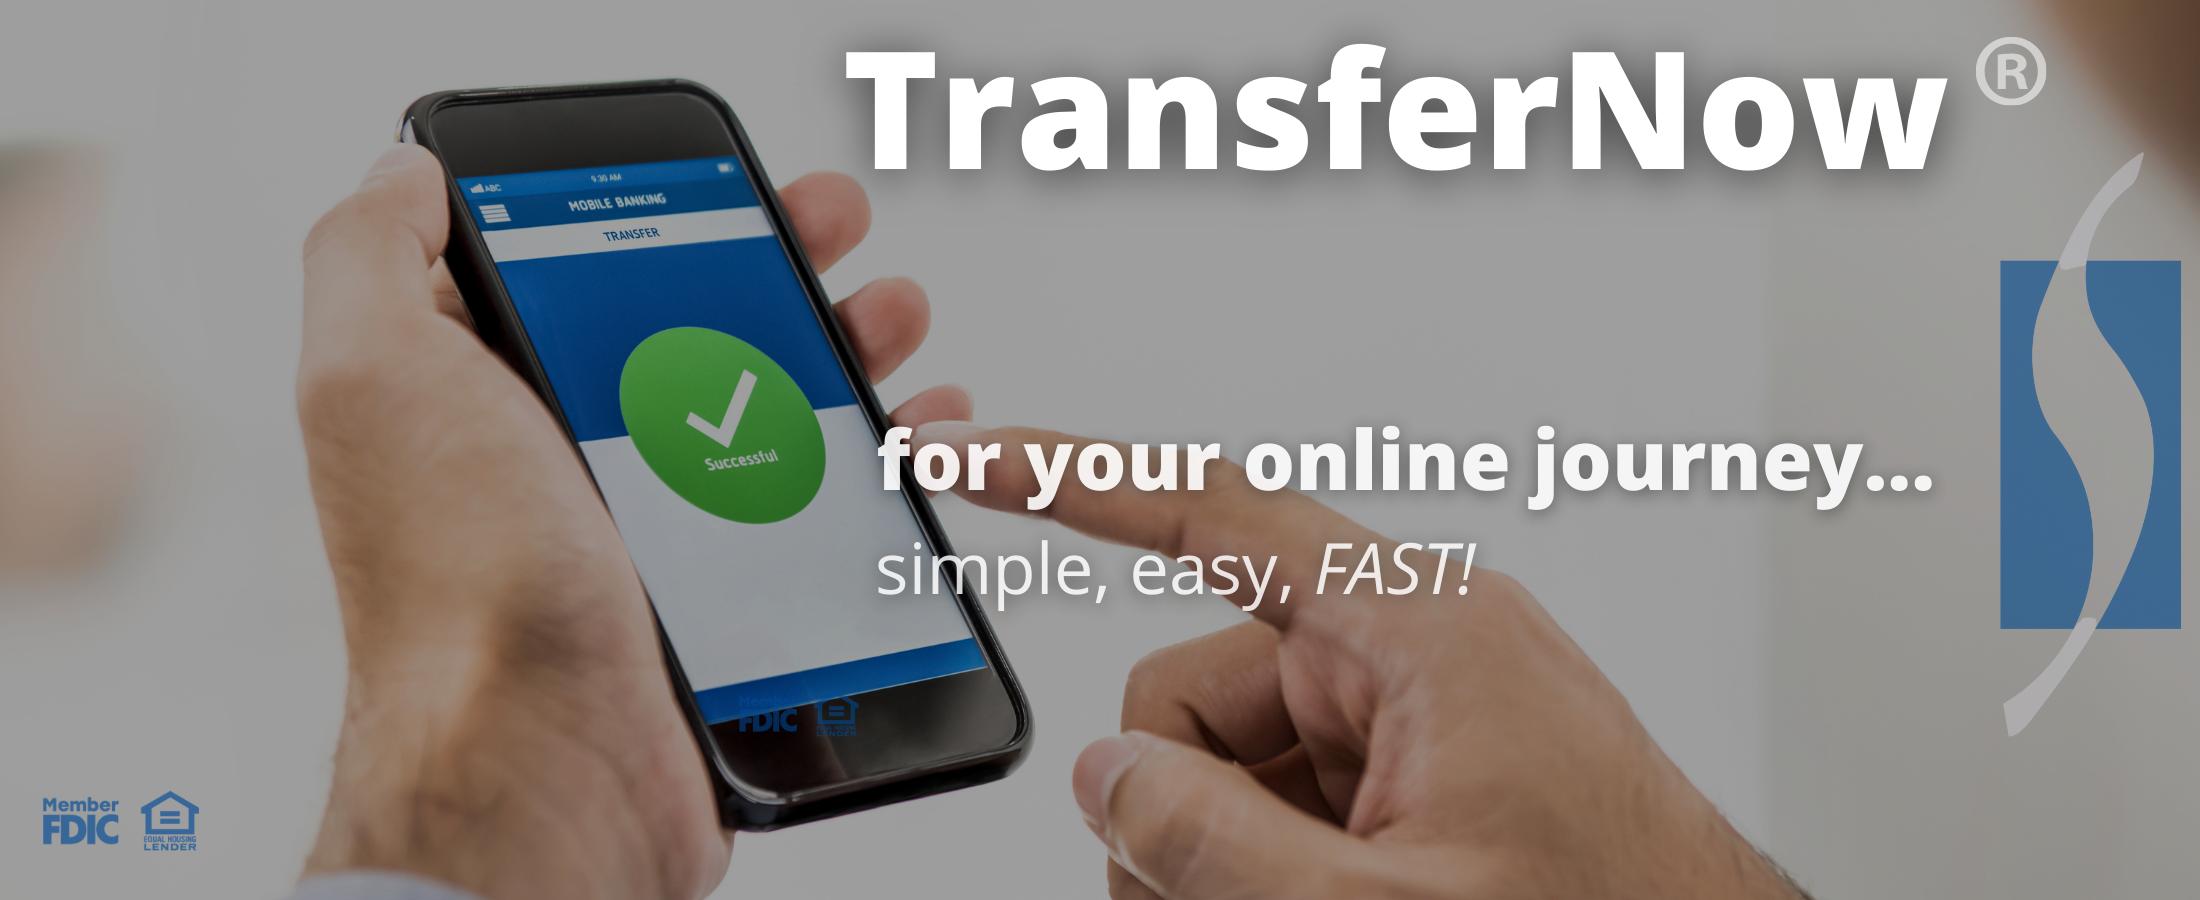 transfernow online digital banking innovation with seneca savings